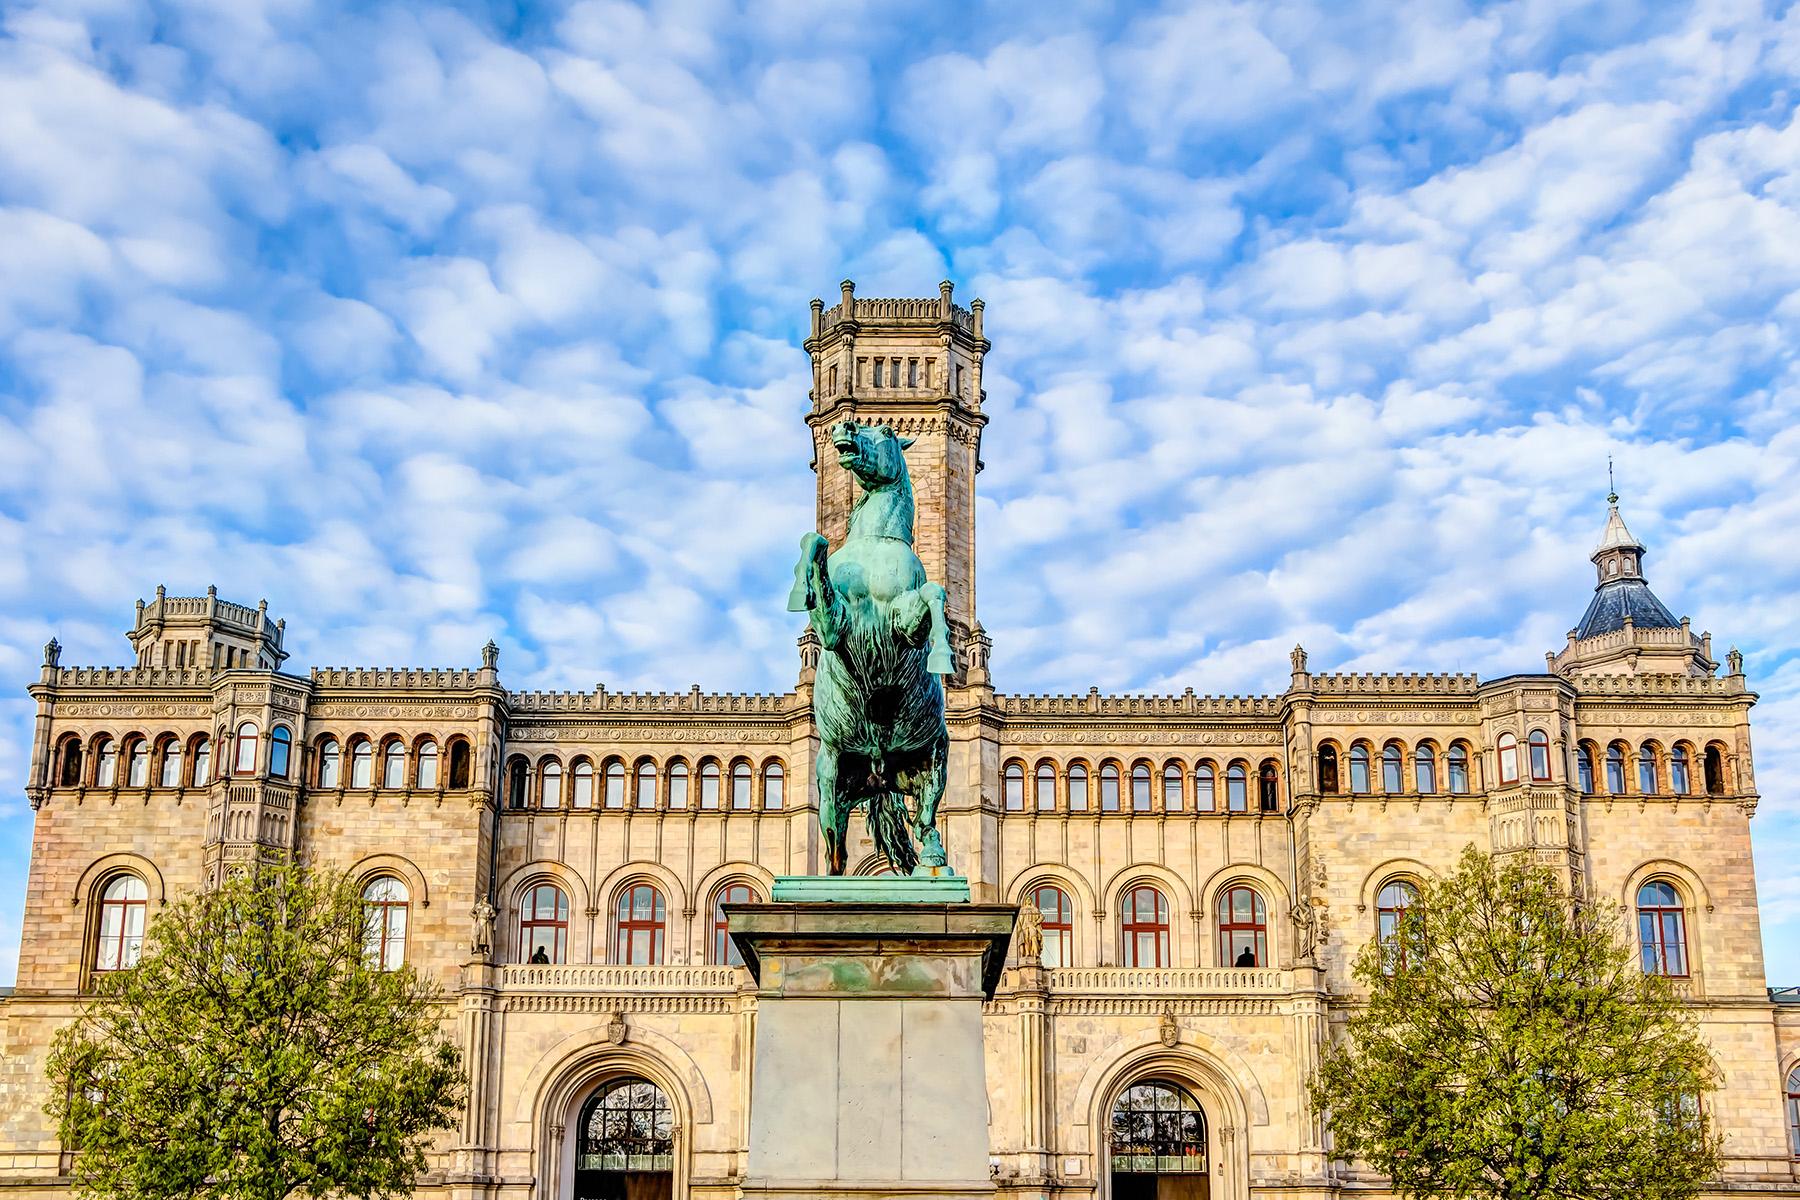 Leibniz University in Hamburg